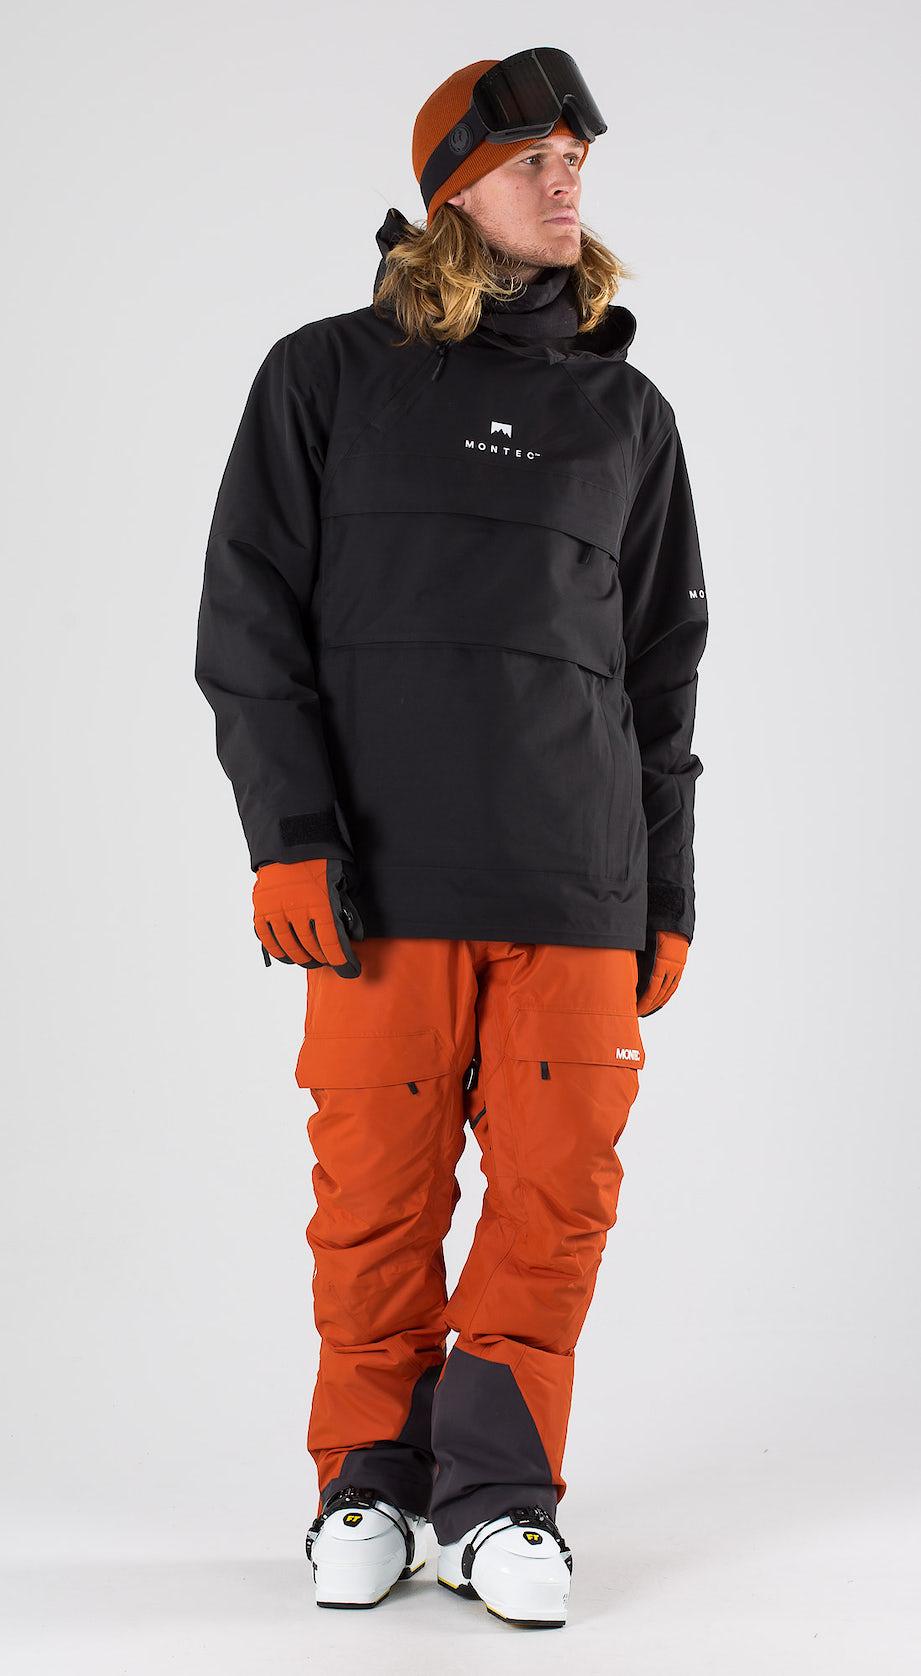 Montec Dune Black Ski clothing Multi